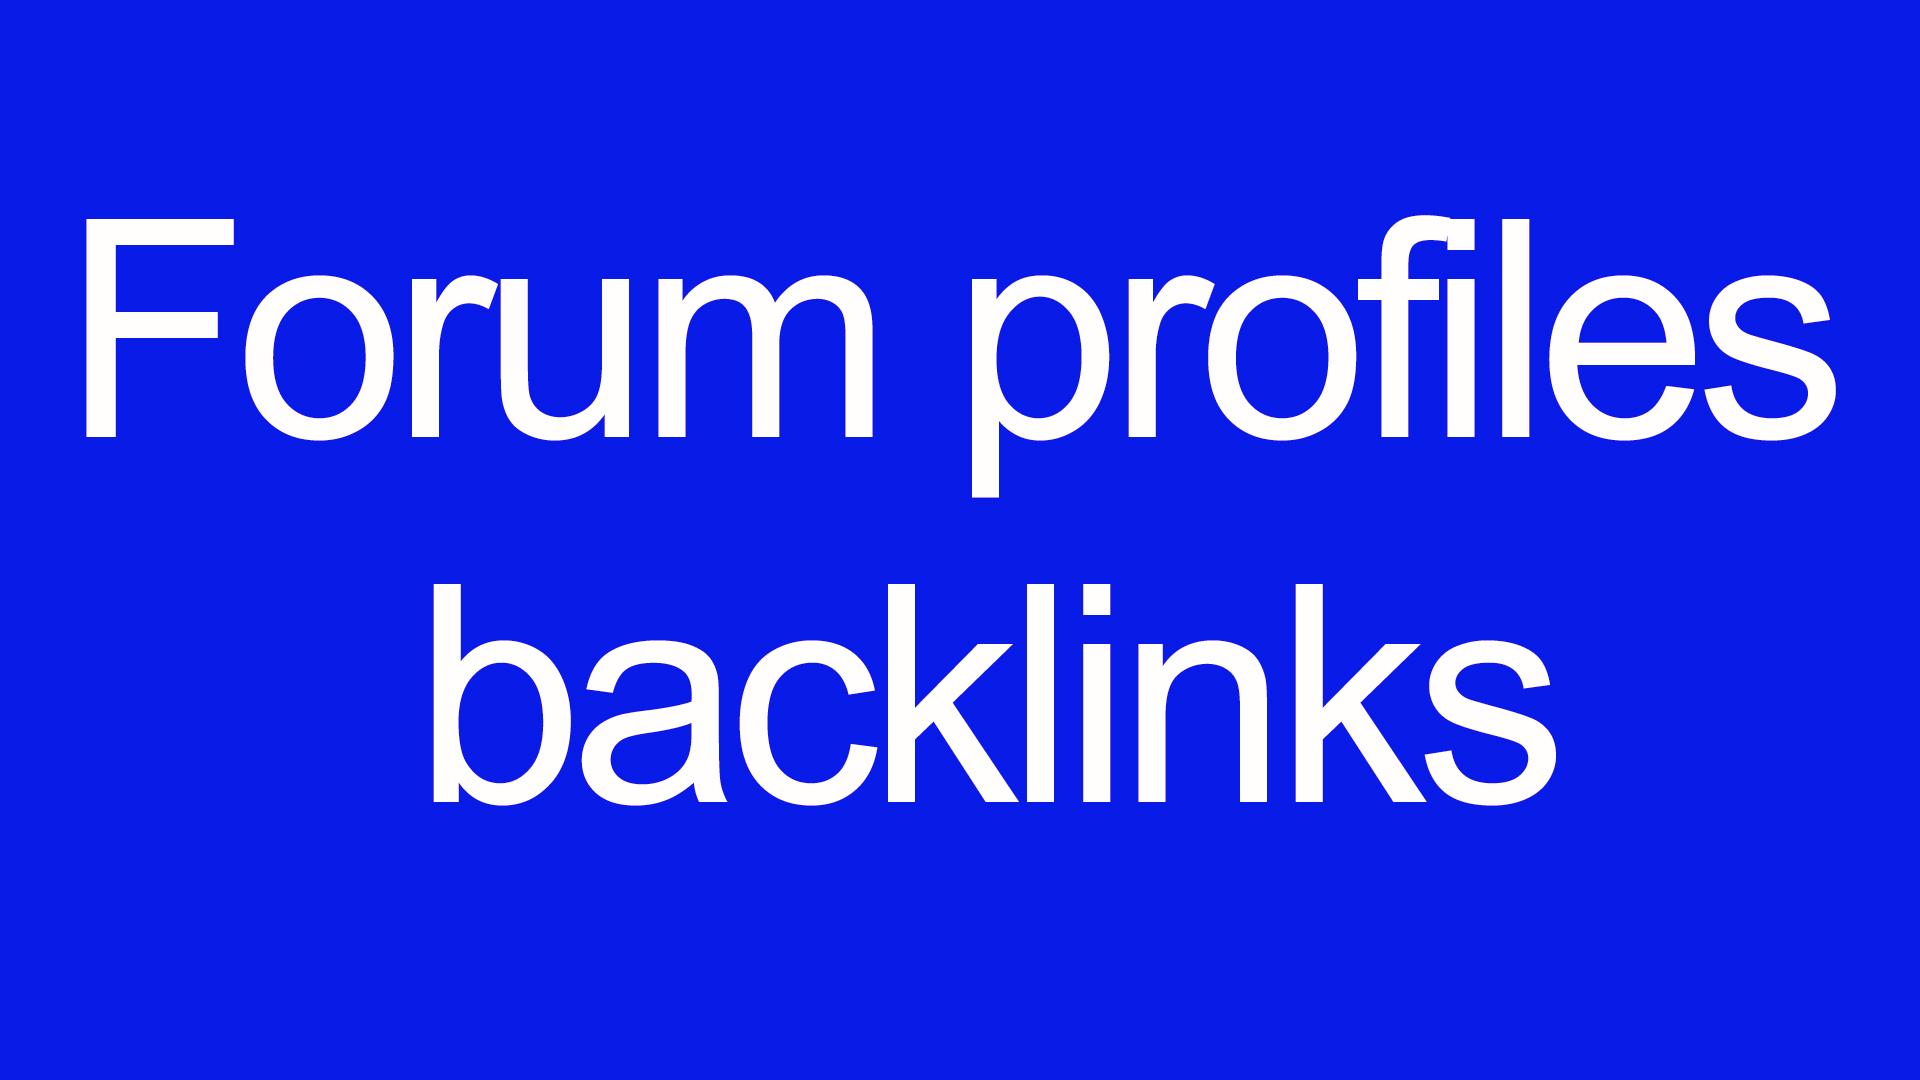 Forum profiles backlinks 5000 backlinks for your site